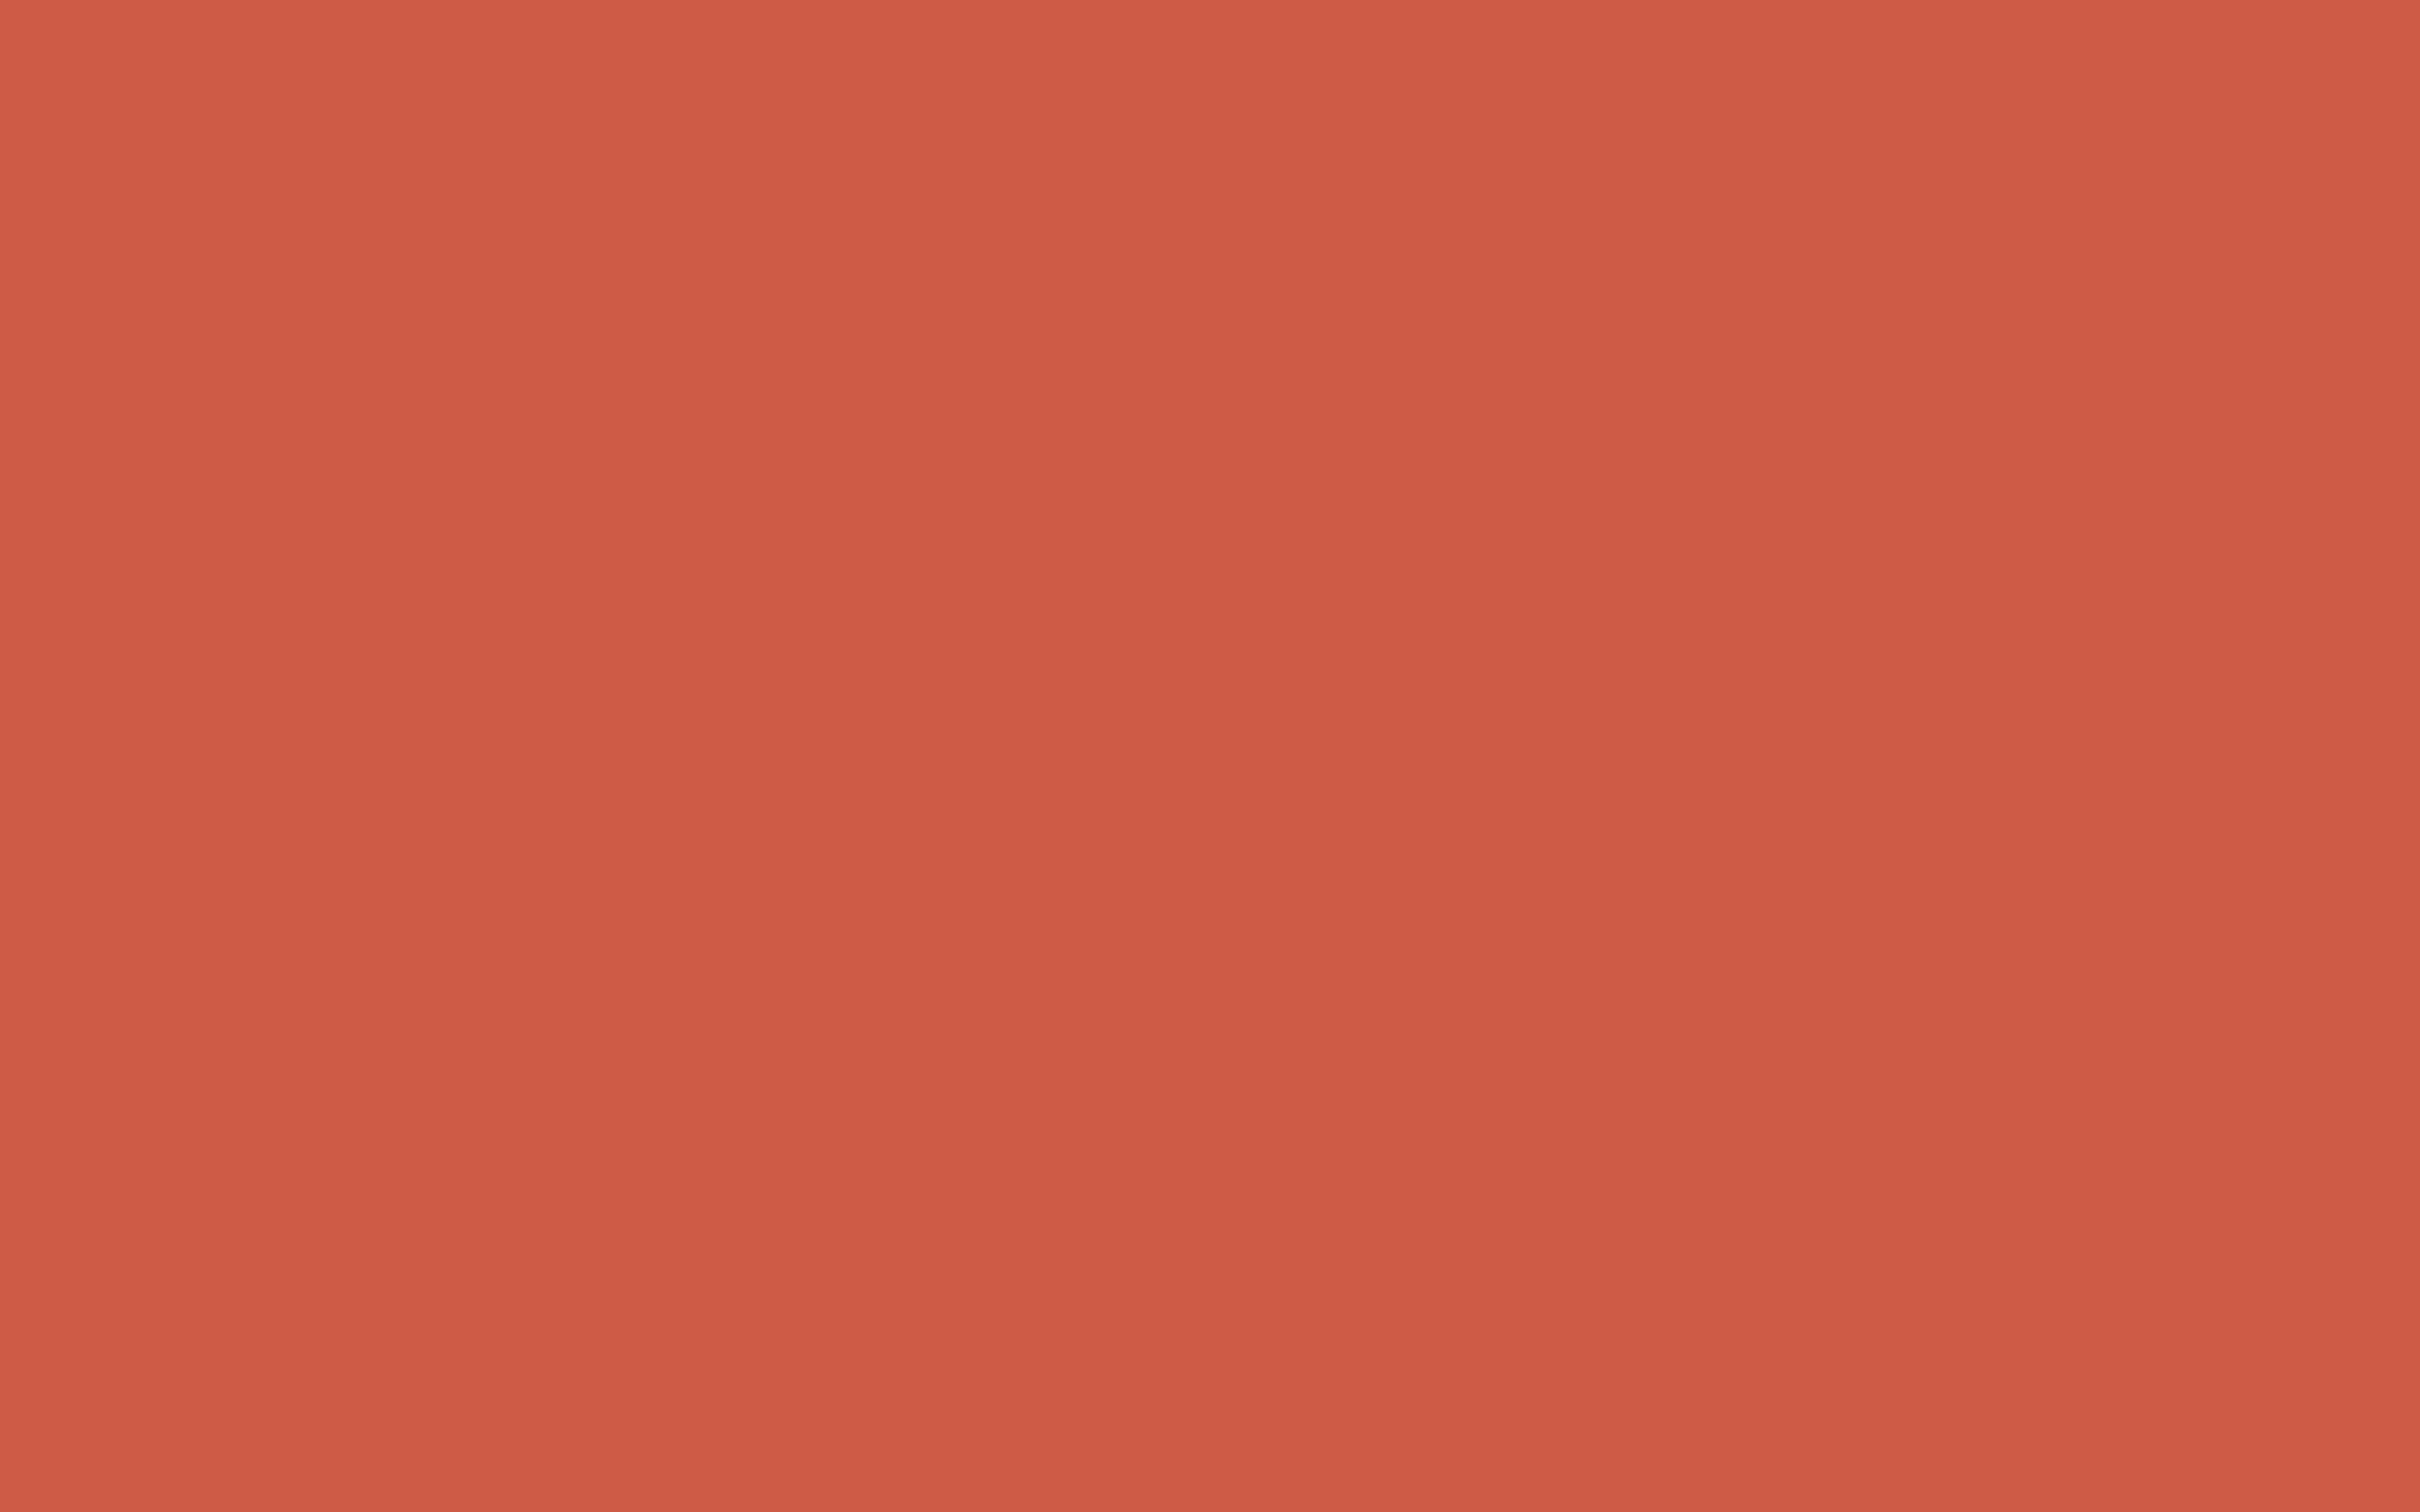 2560x1600 Dark Coral Solid Color Background